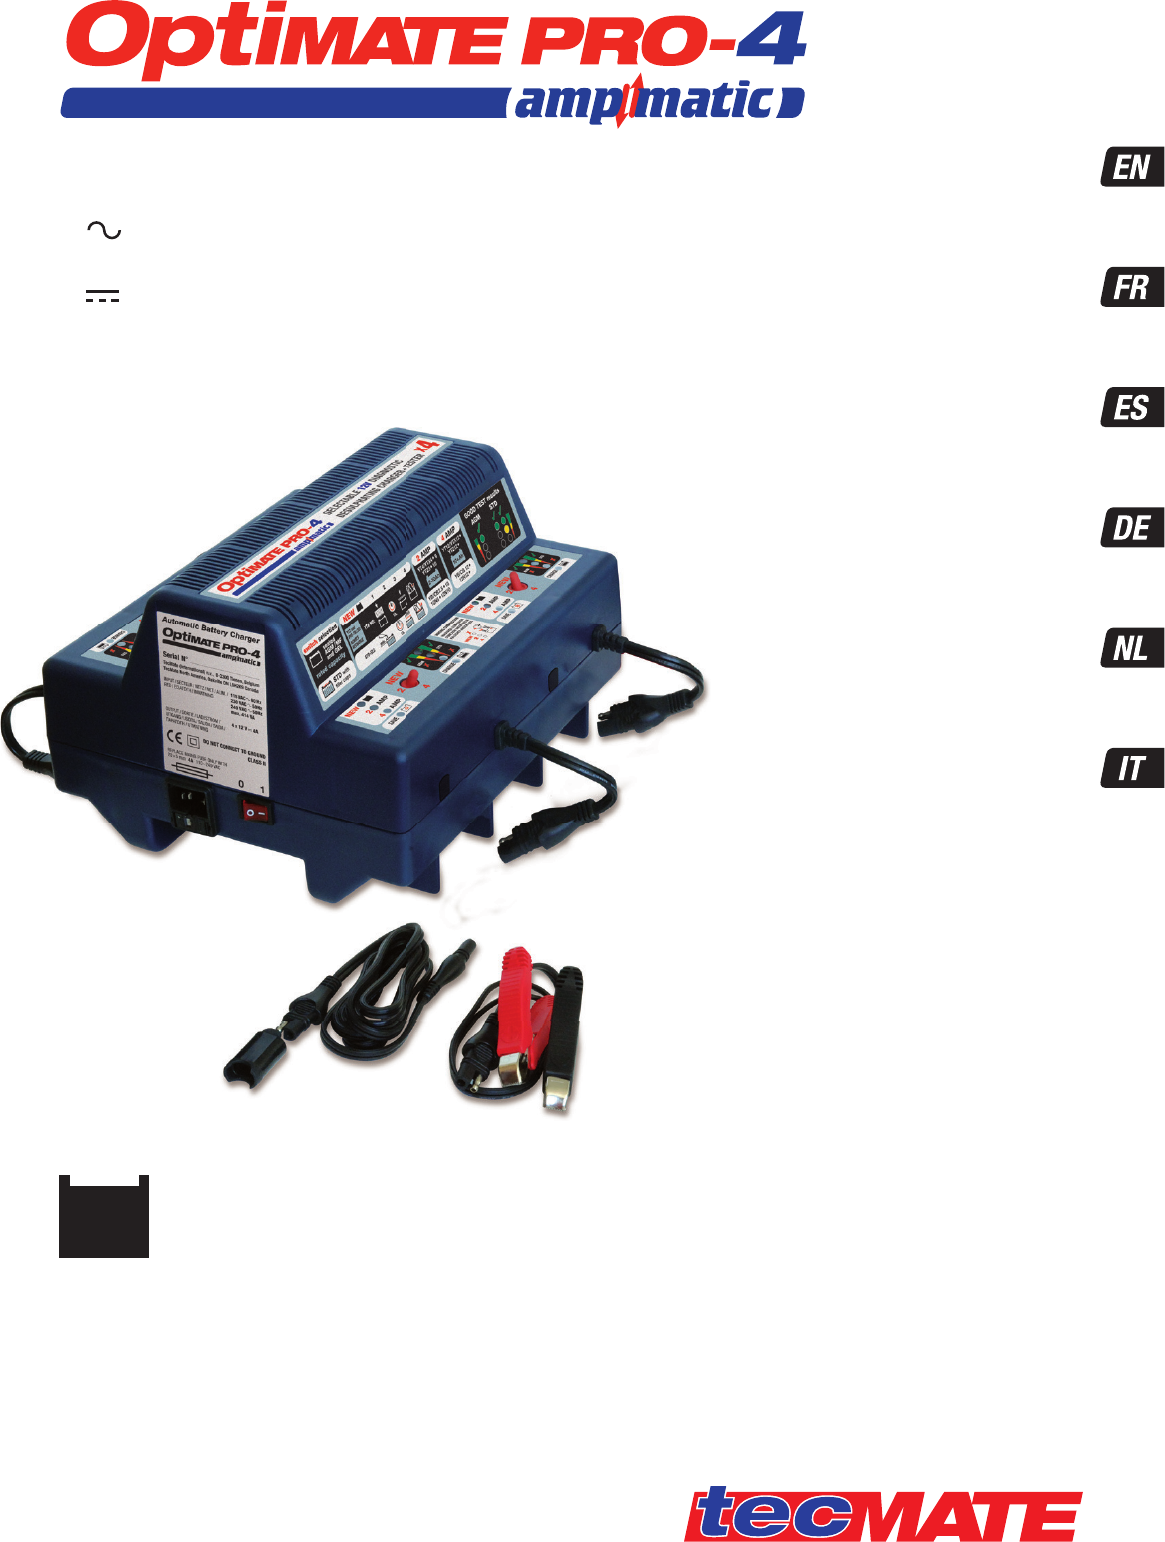 Handleiding Tecmate Optimate Pro 4 Ts52 Pagina 1 Van 8 Deutsch